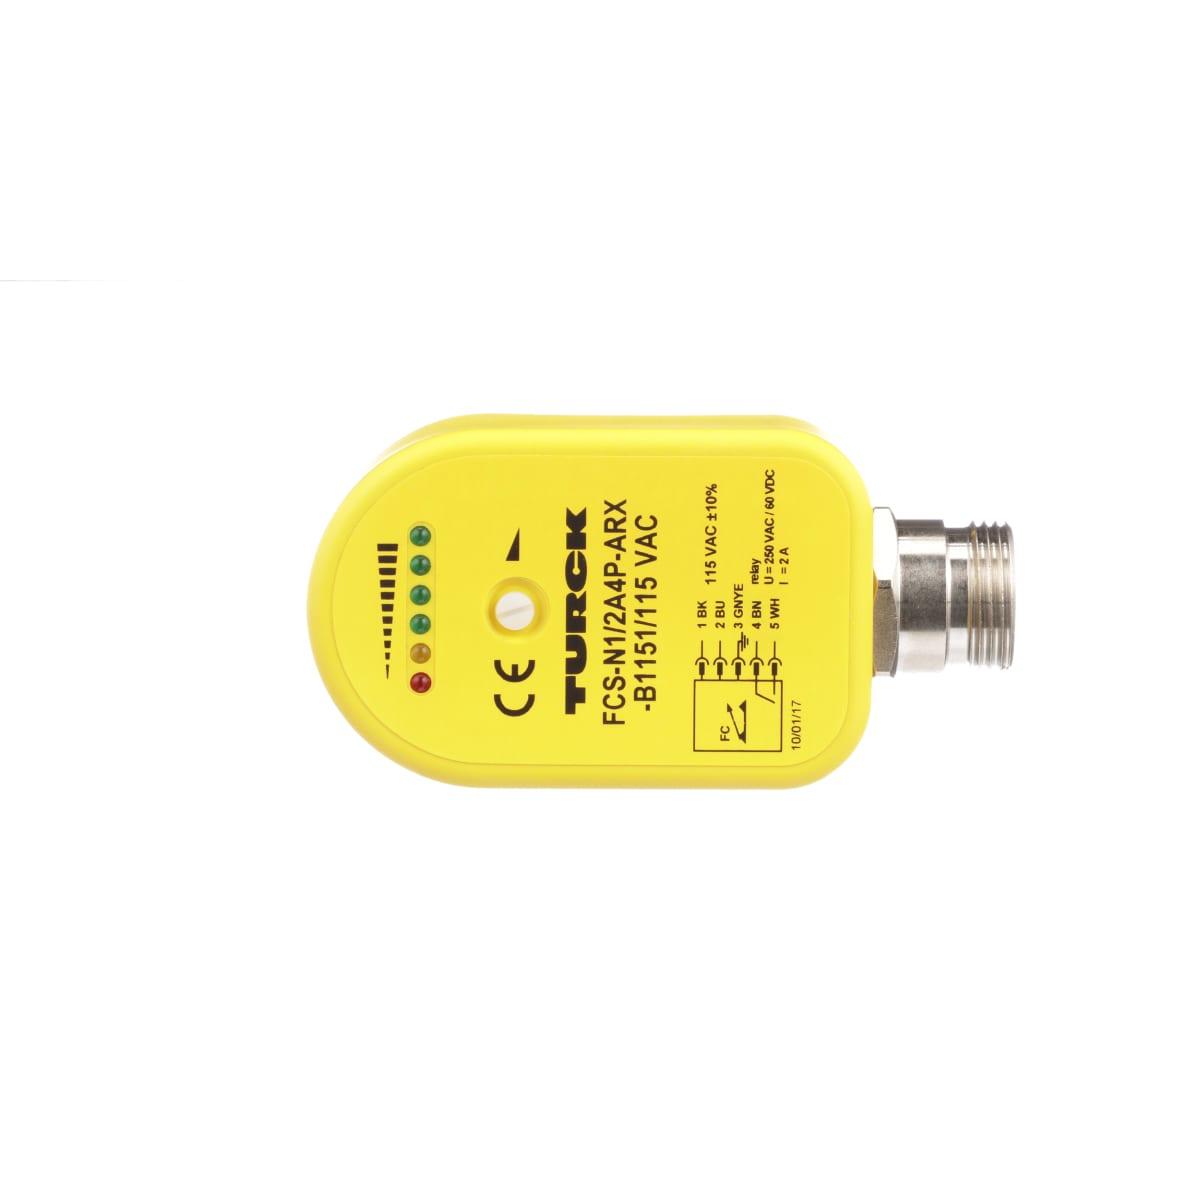 Turck Fcs N1 2a4p Arx B1151 115vac Sensor Wiring Diagram Close